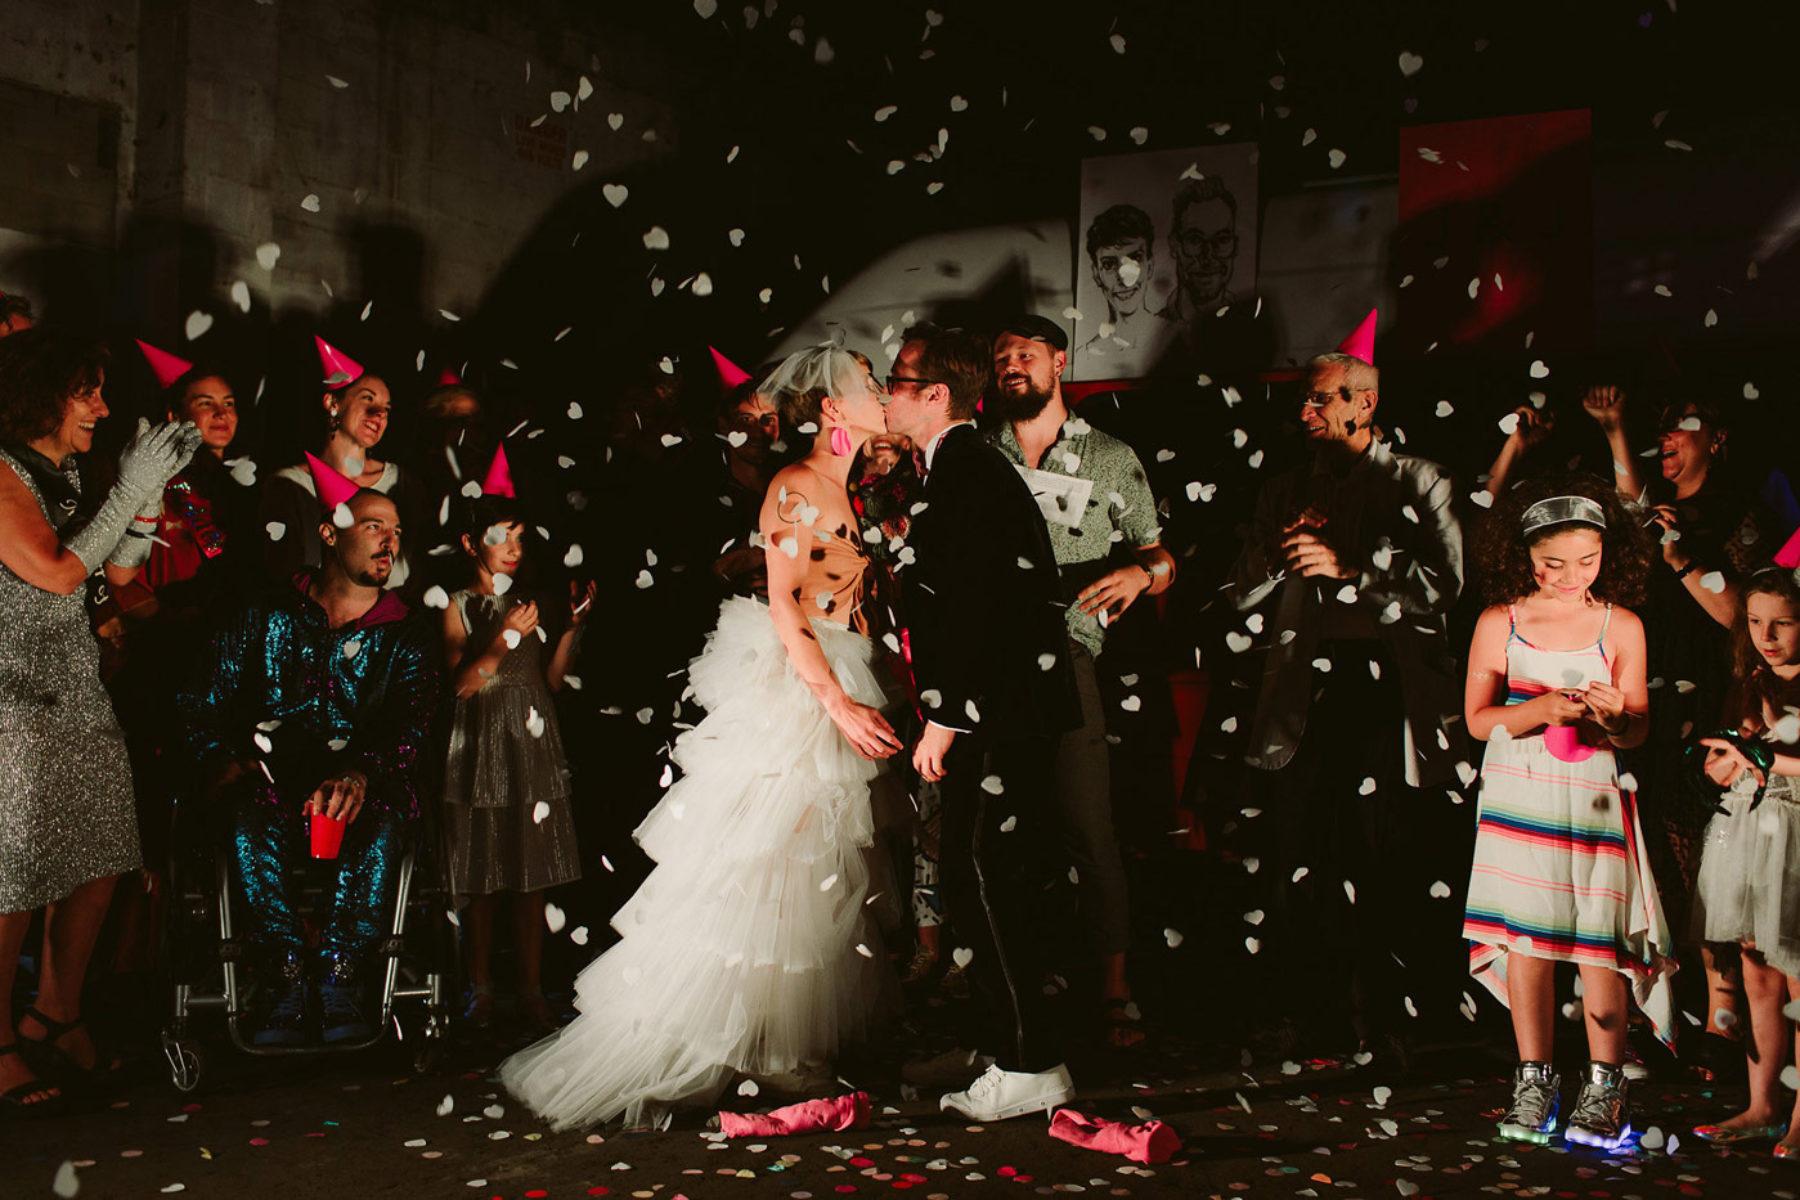 adelaide-warehouse-party-wedding-42-1800x0-c-default.jpg